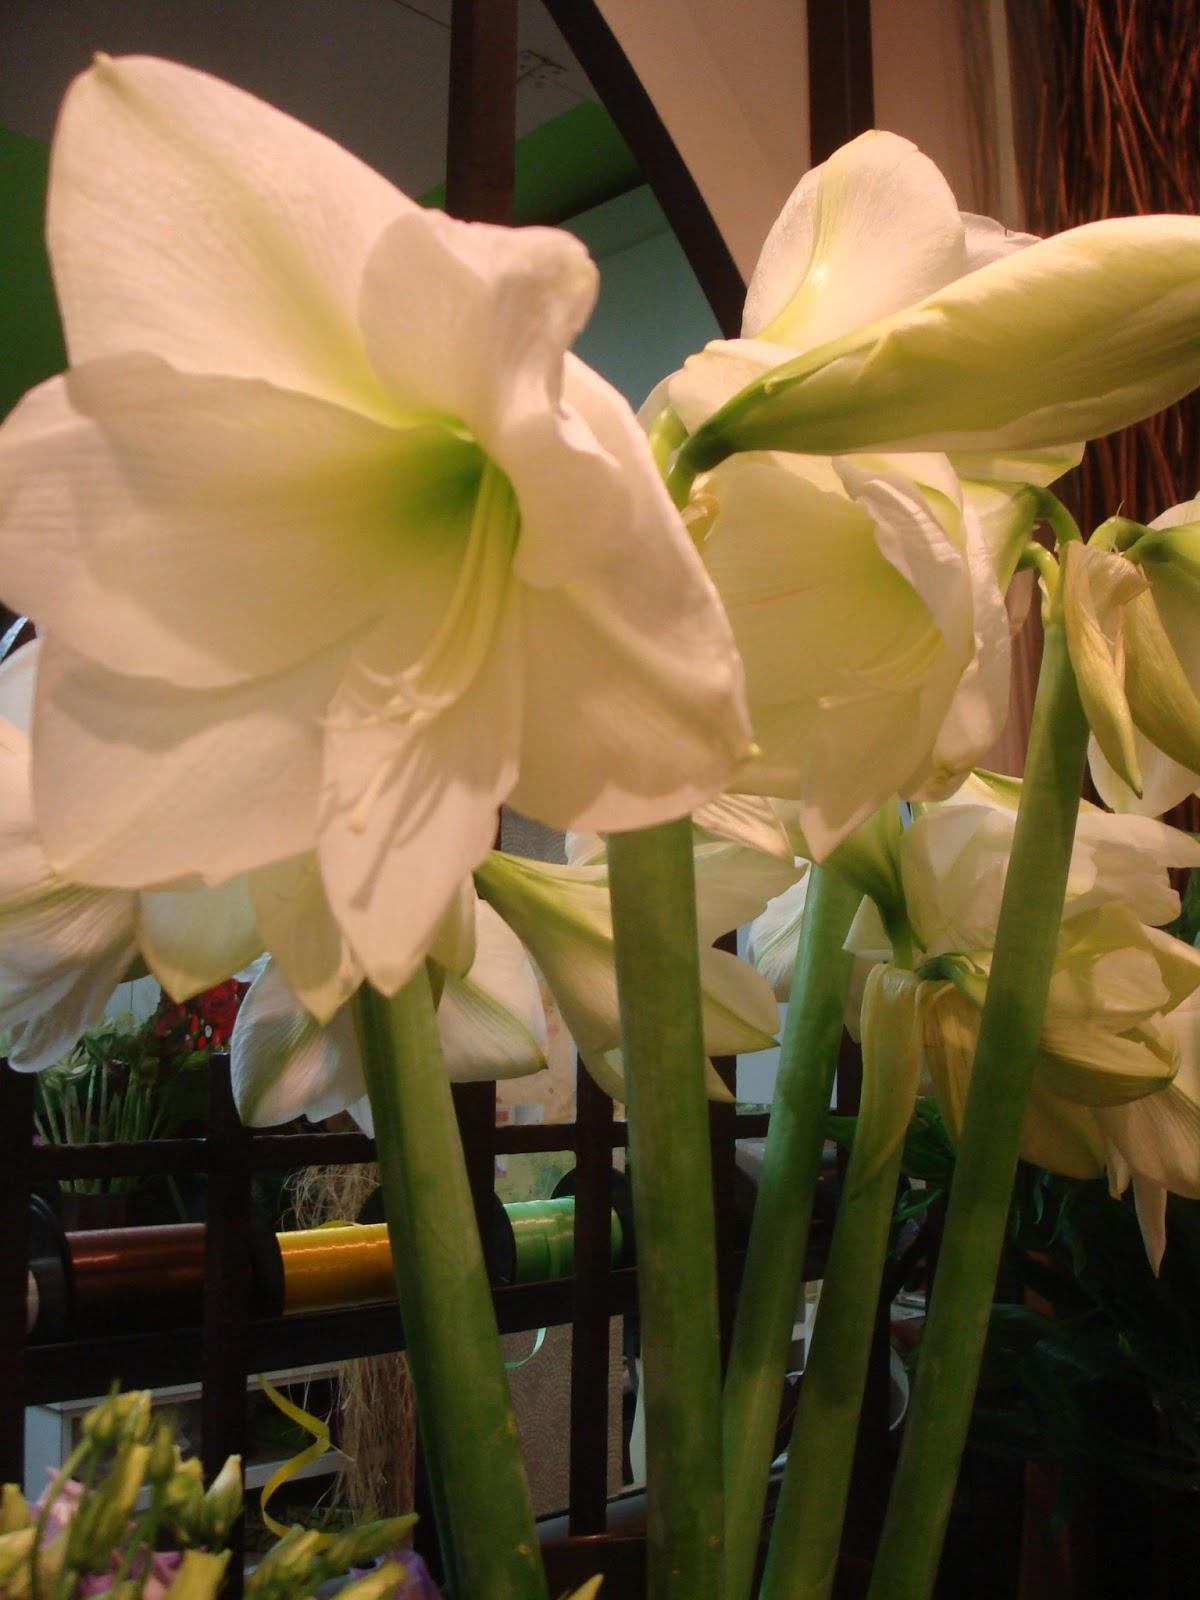 Fleuriste isabelle feuvrier l 39 amaryllis mont blanc for Amaryllis fleuriste